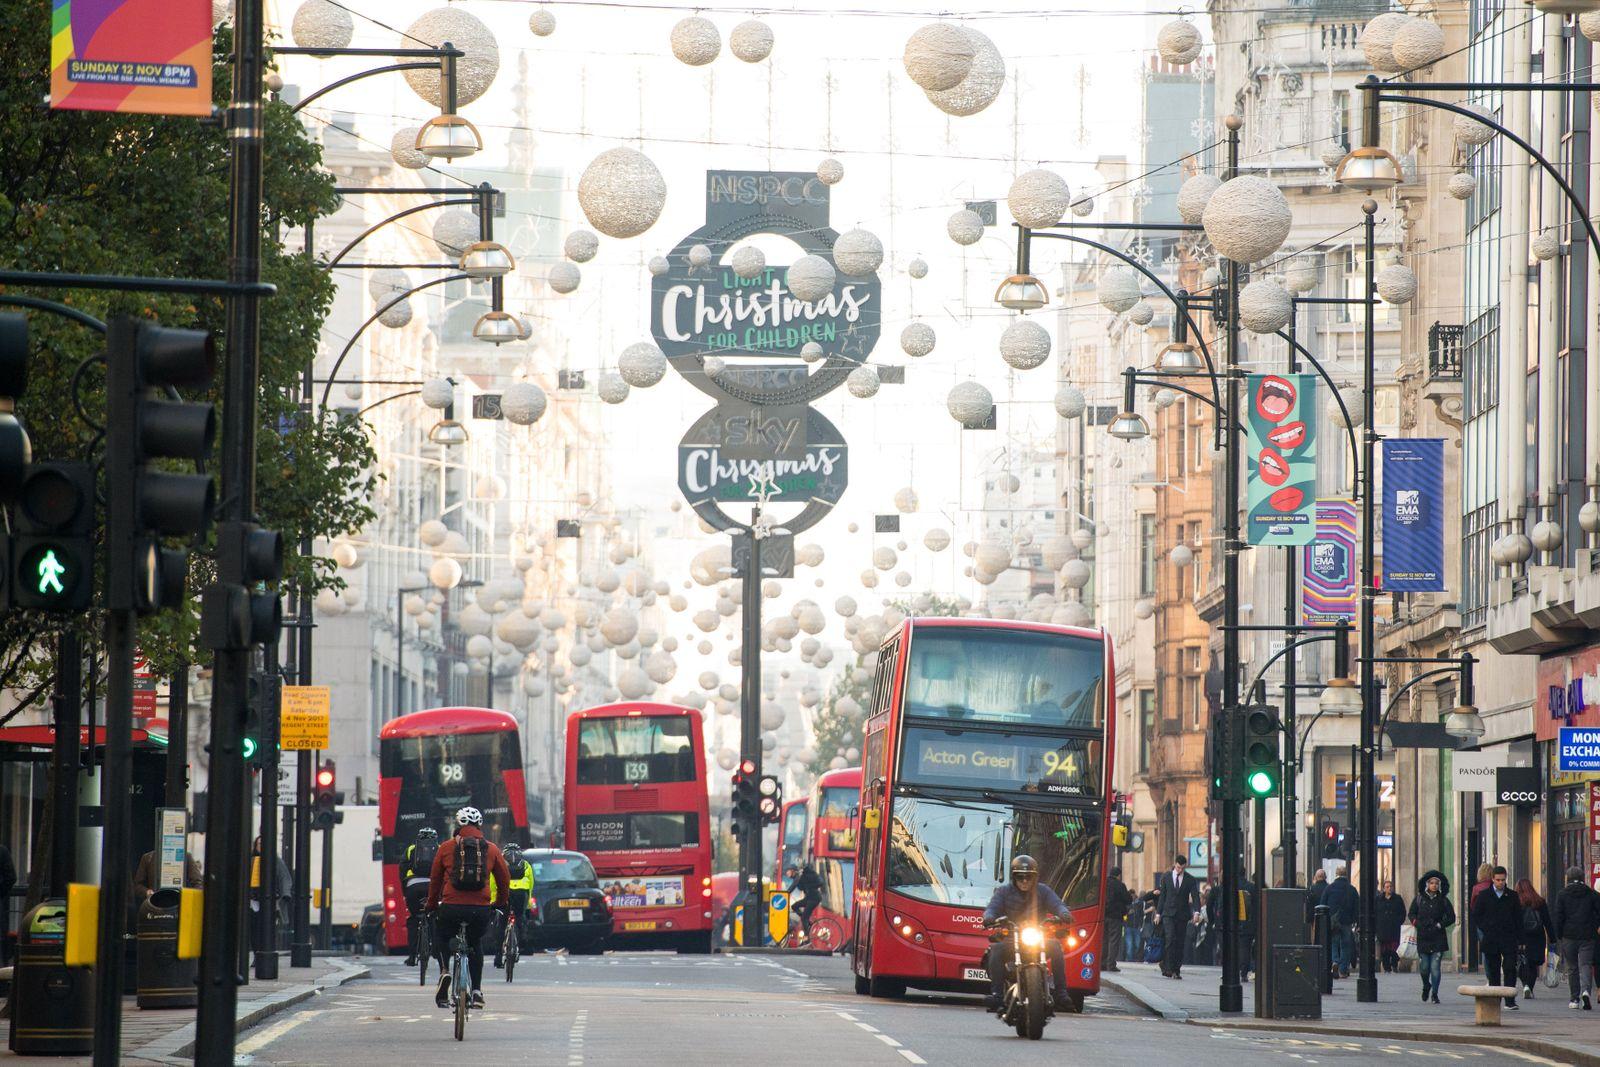 Einkaufsmeile Oxford Street in London